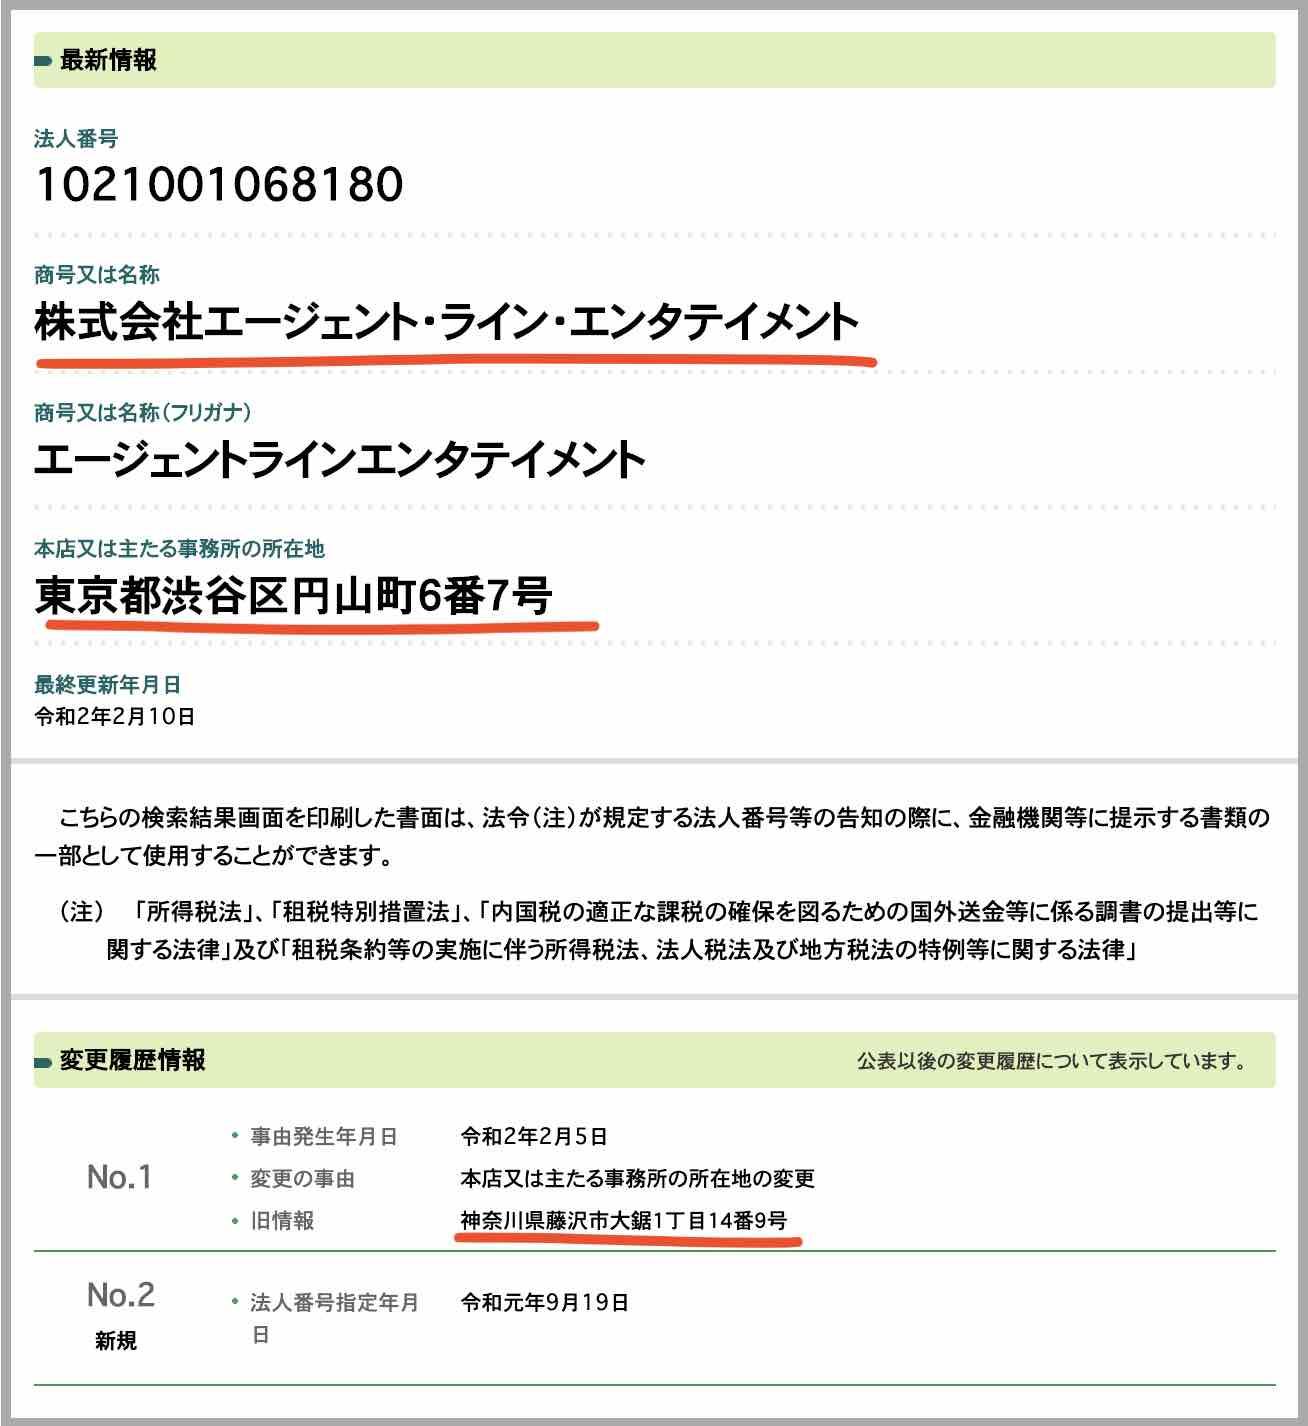 MUTEKIという競馬予想サイトの運営社株式会社エージェントラインエンターテイメント